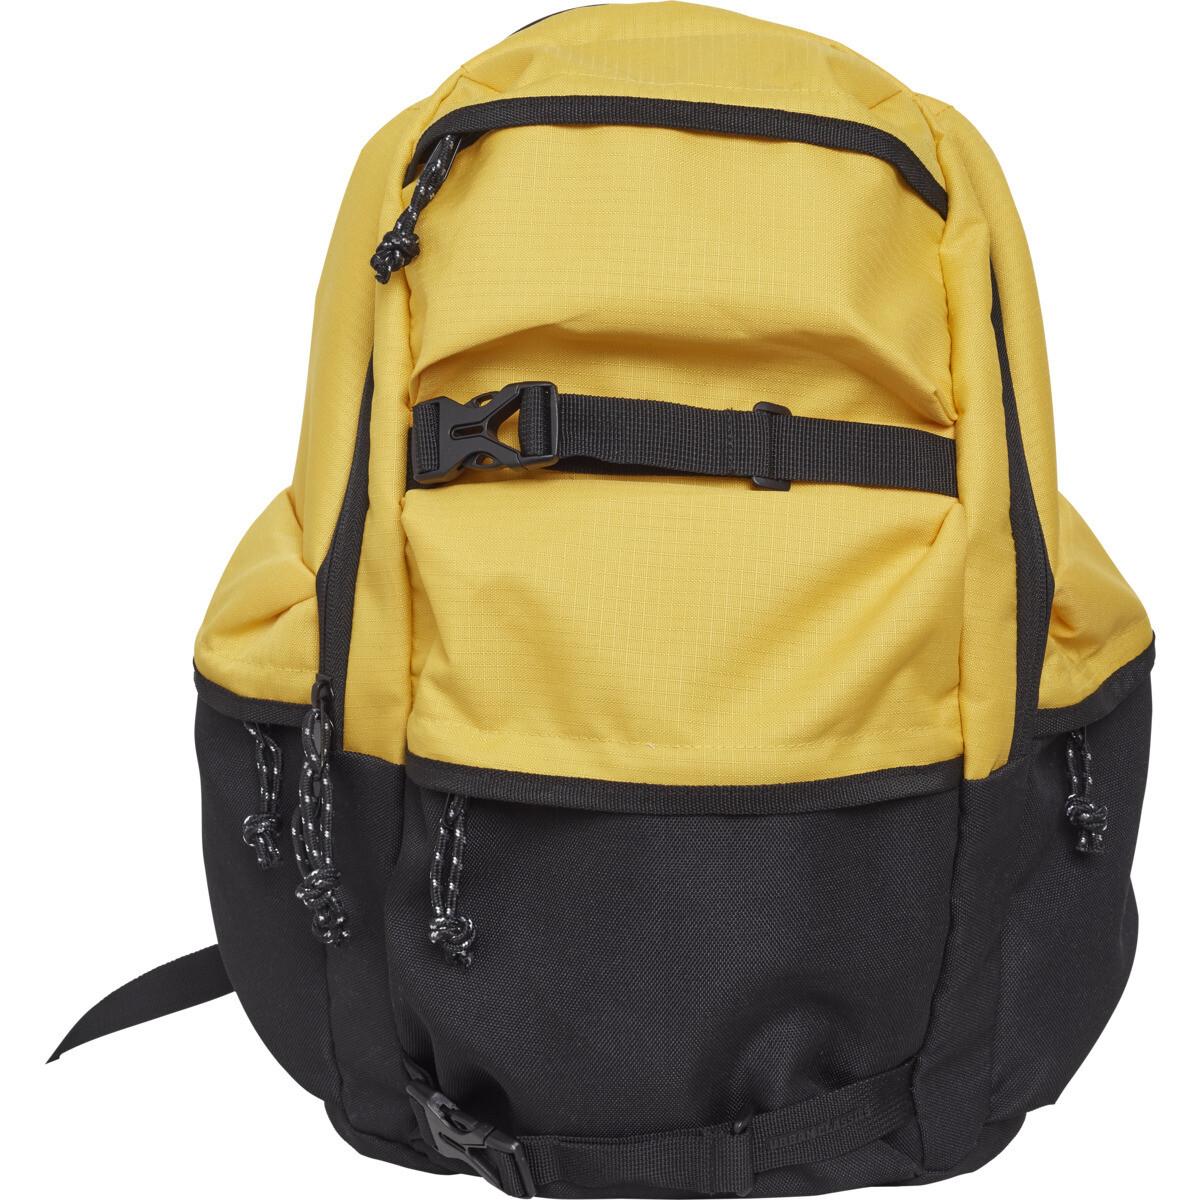 Backpack Colourblocking - Chrome Yellow